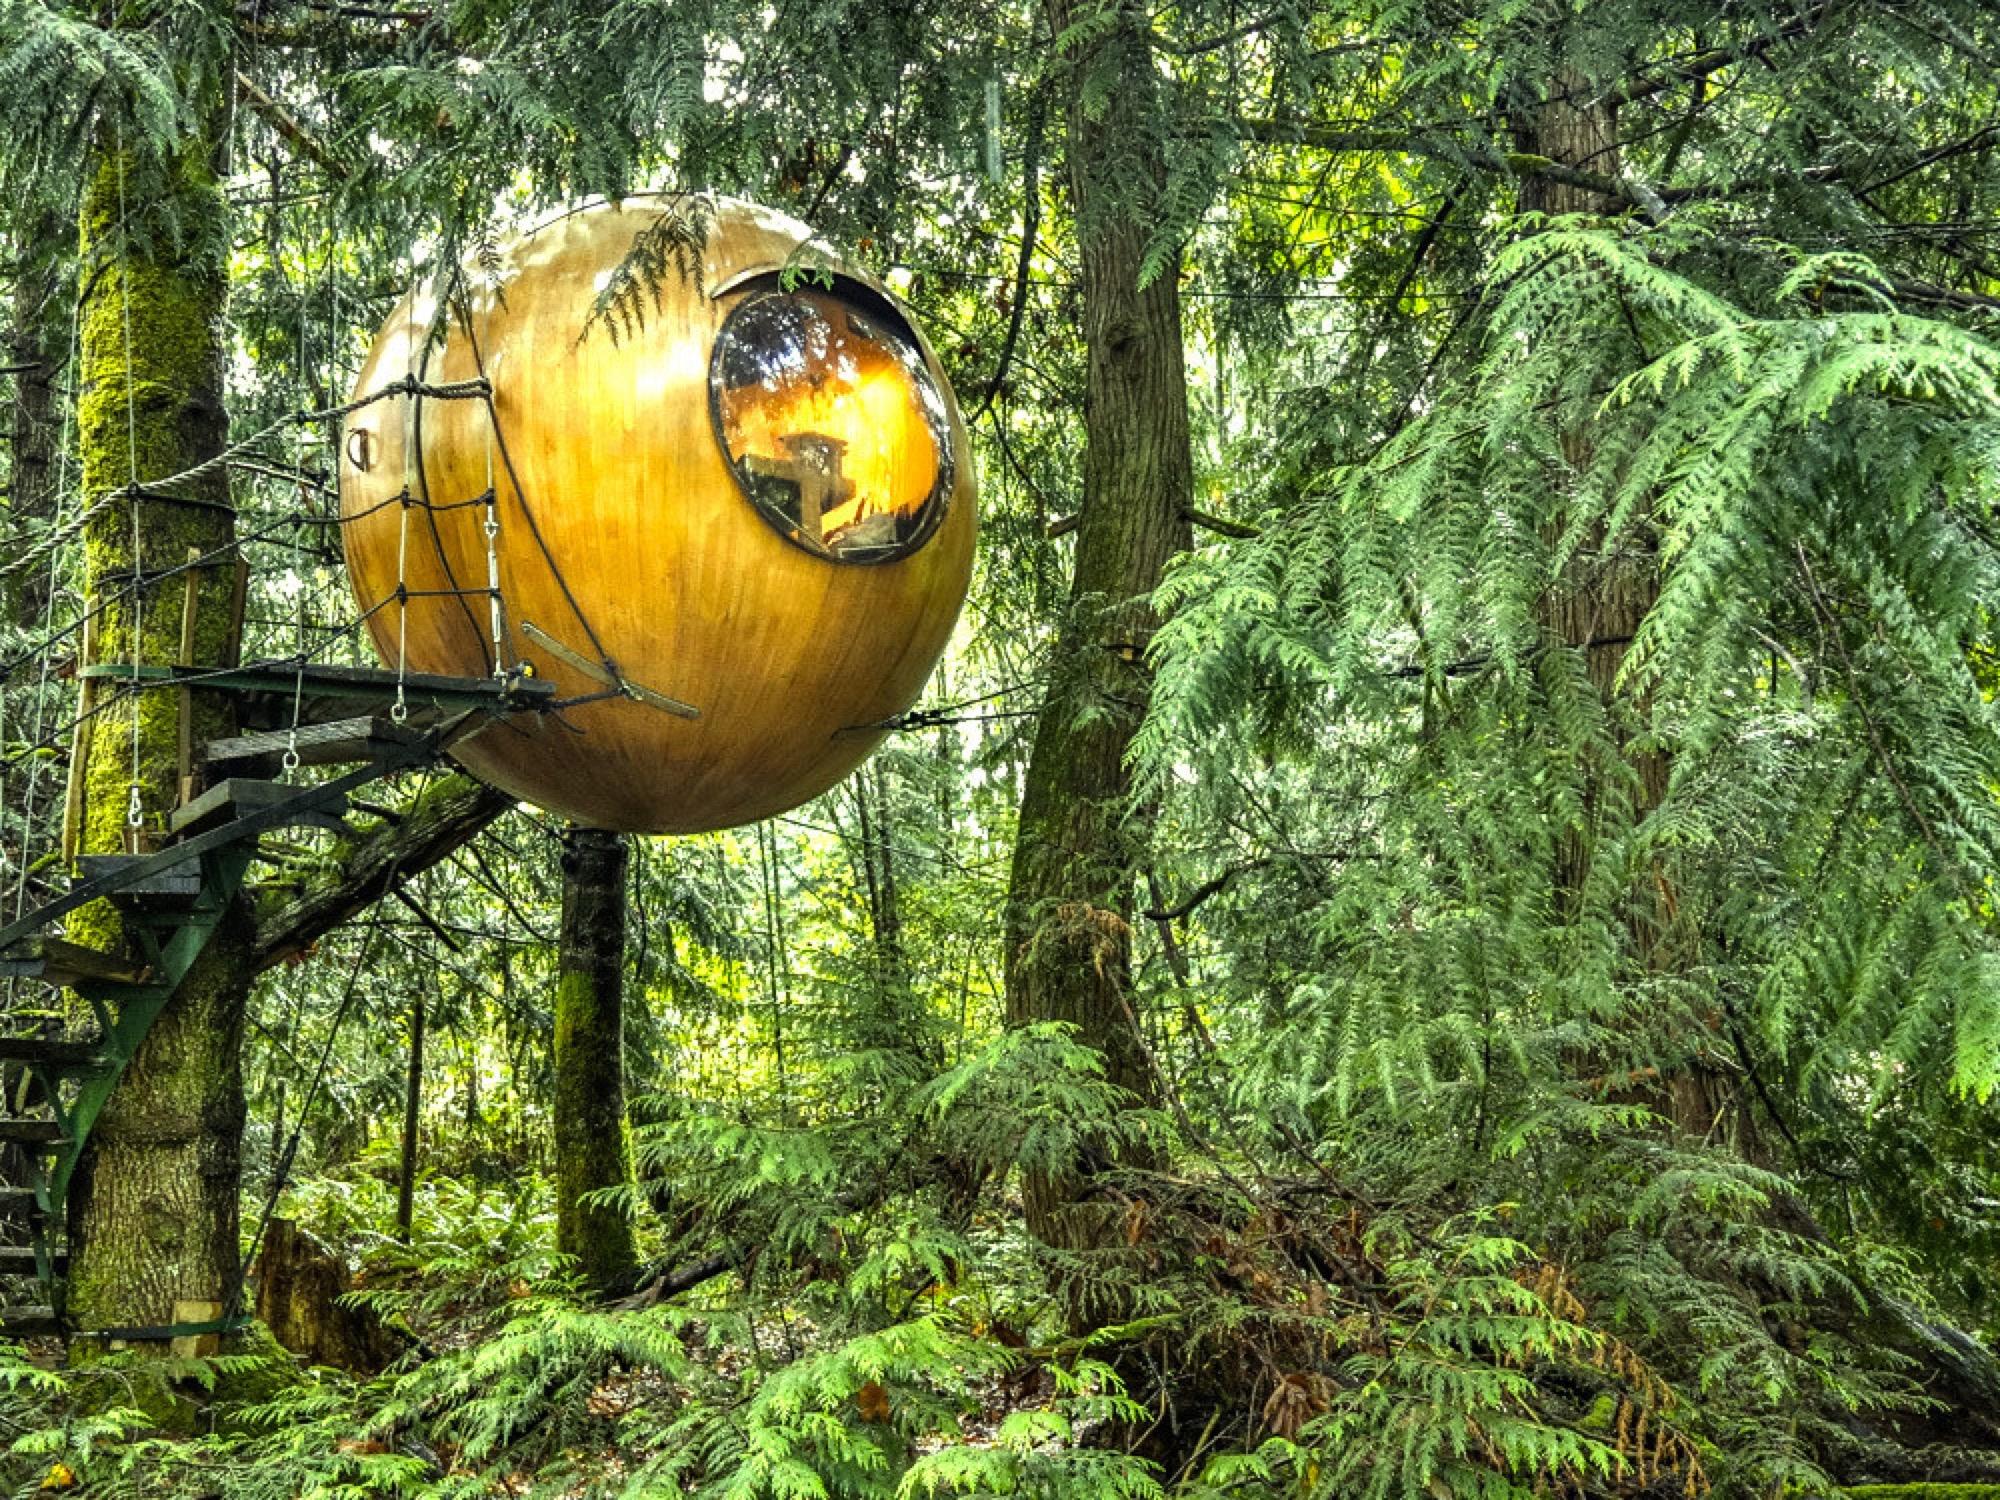 Spherical tree house by Free Spirit Spheres / Photo Courtesy of Free Spirit Spheres